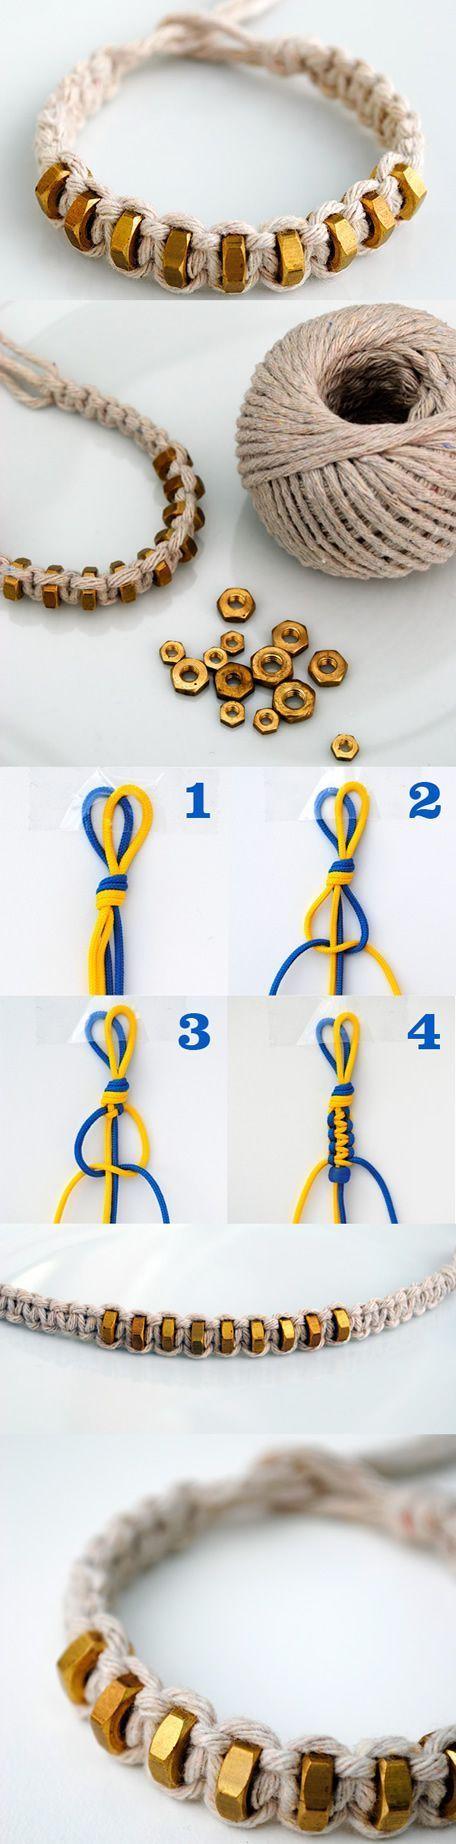 Armband knüpfen - DIY Trends